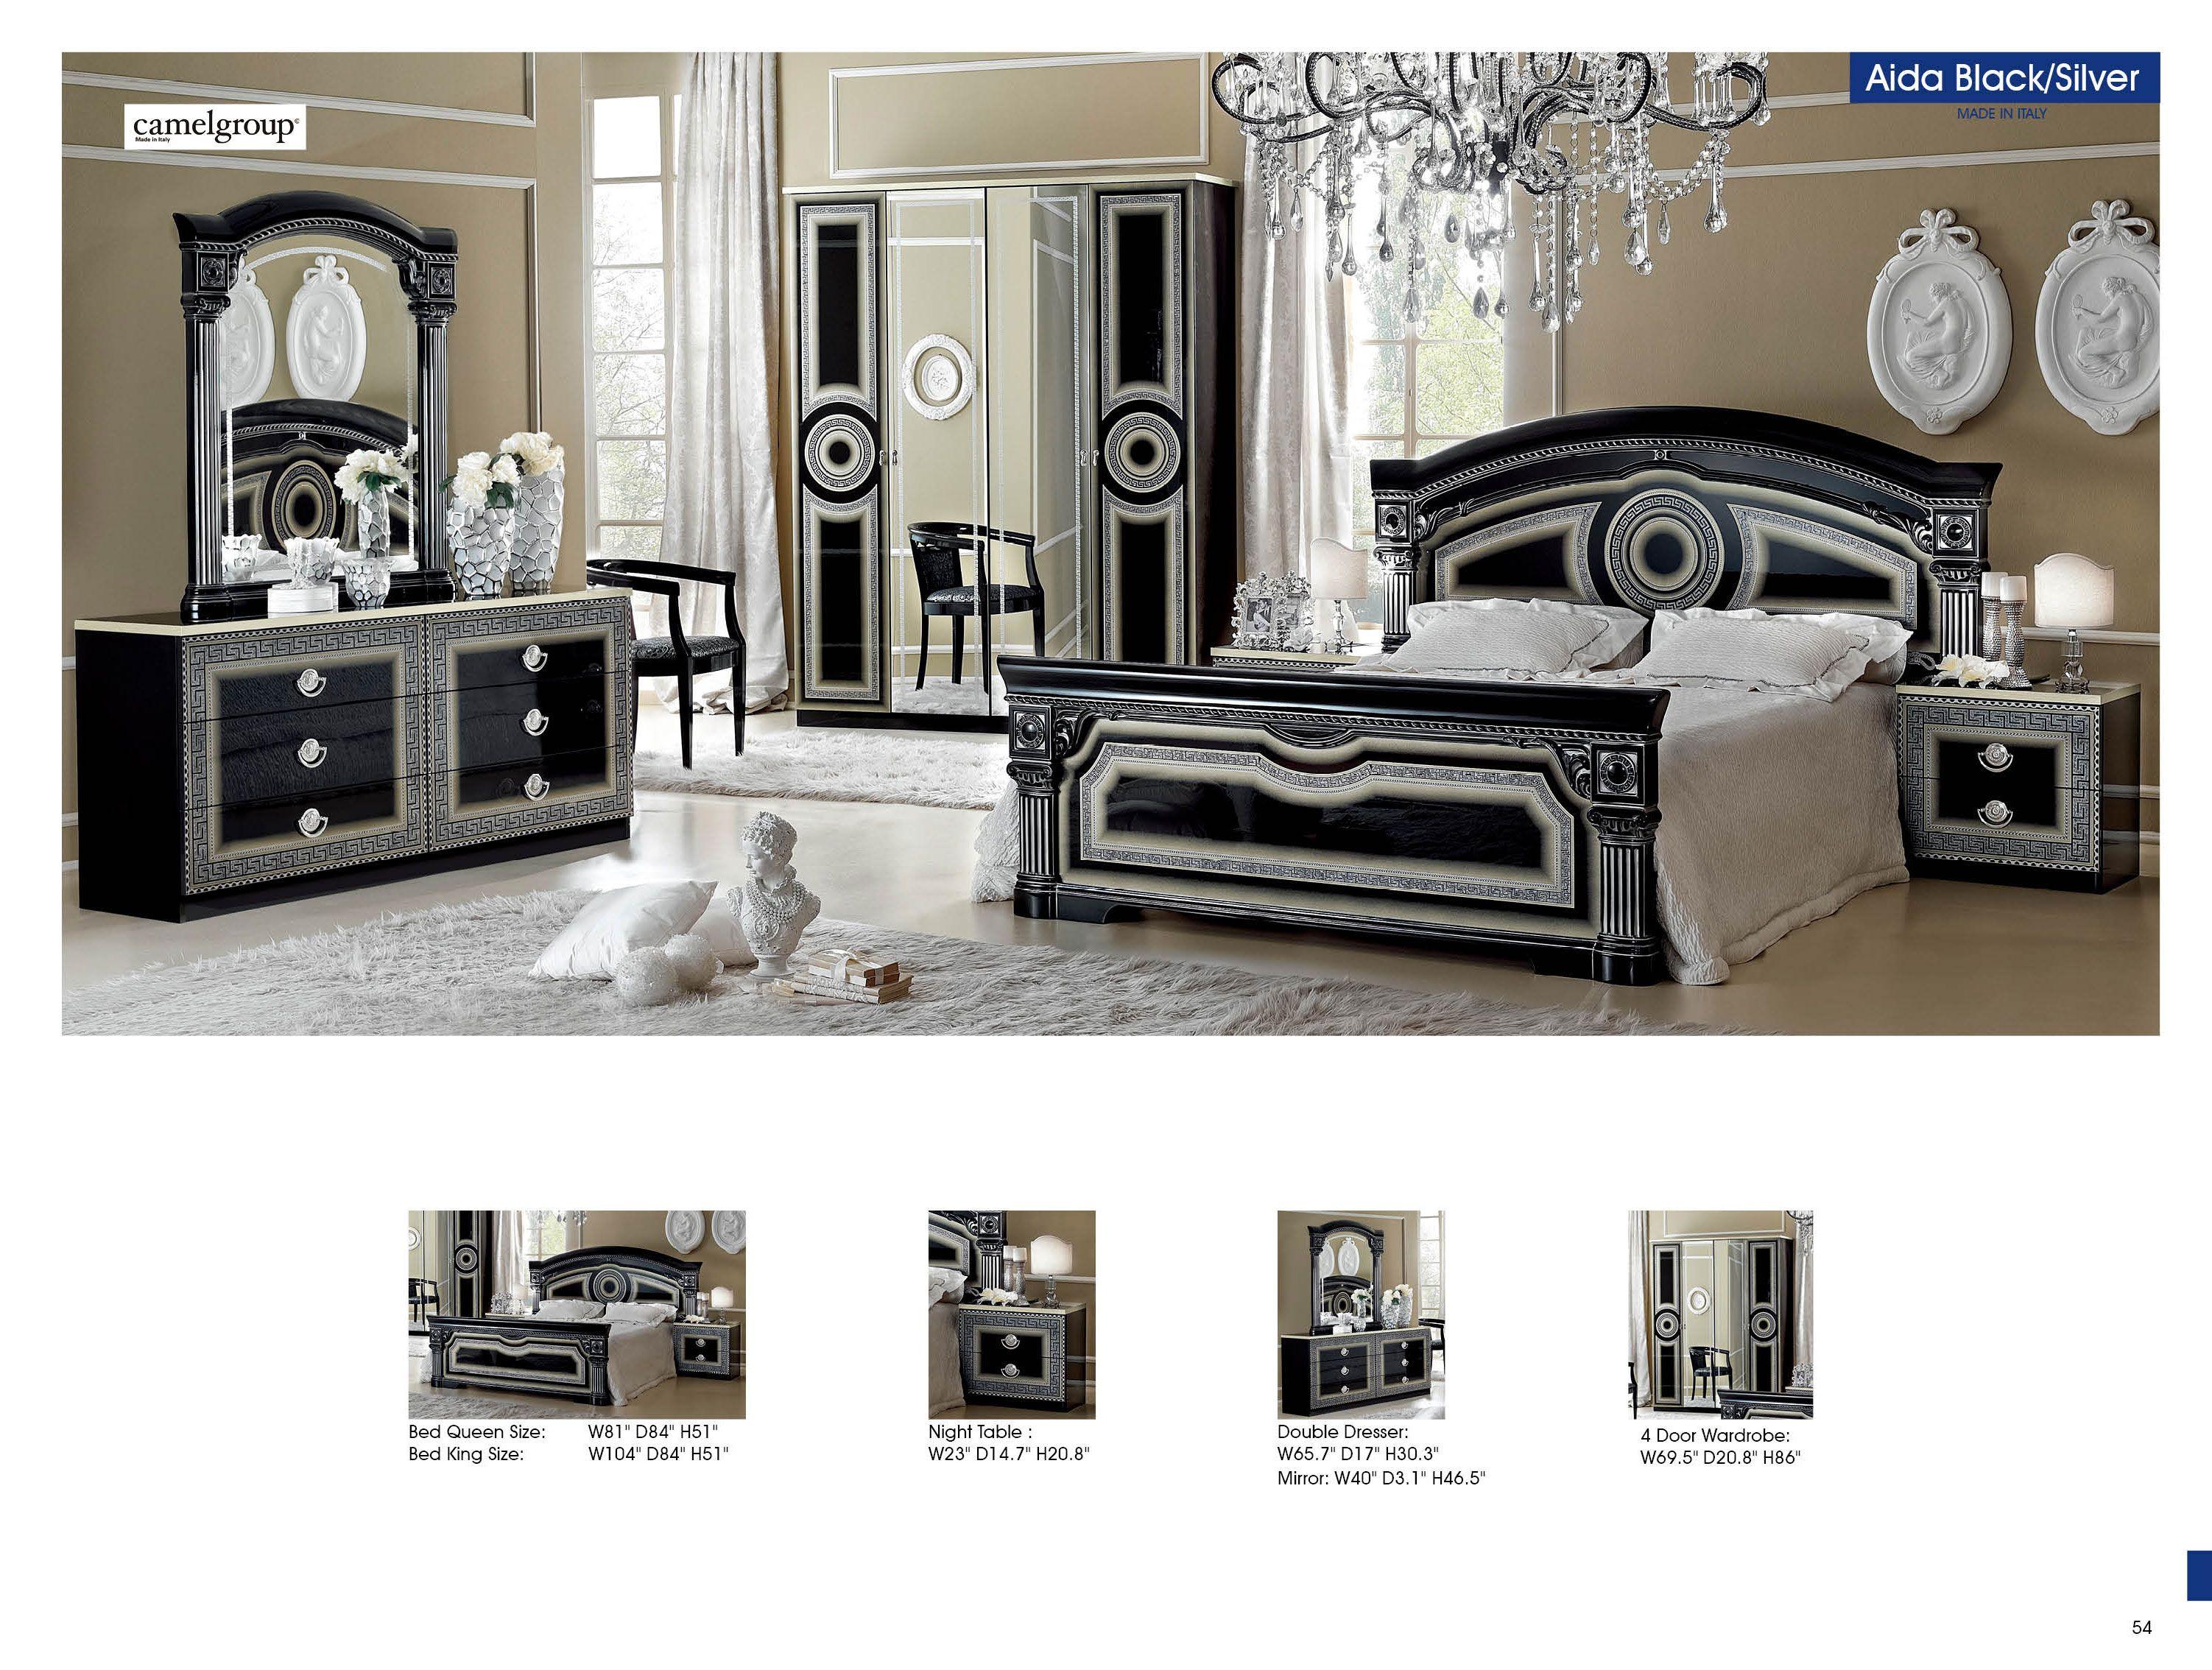 marble top bedroom furniture%0A Versace Home   Versace Design Aida Bedroom    For more inspirations visit   www bedroomideas eu    bedroomfurniture  bedroomcolors  bedroomdesignide u